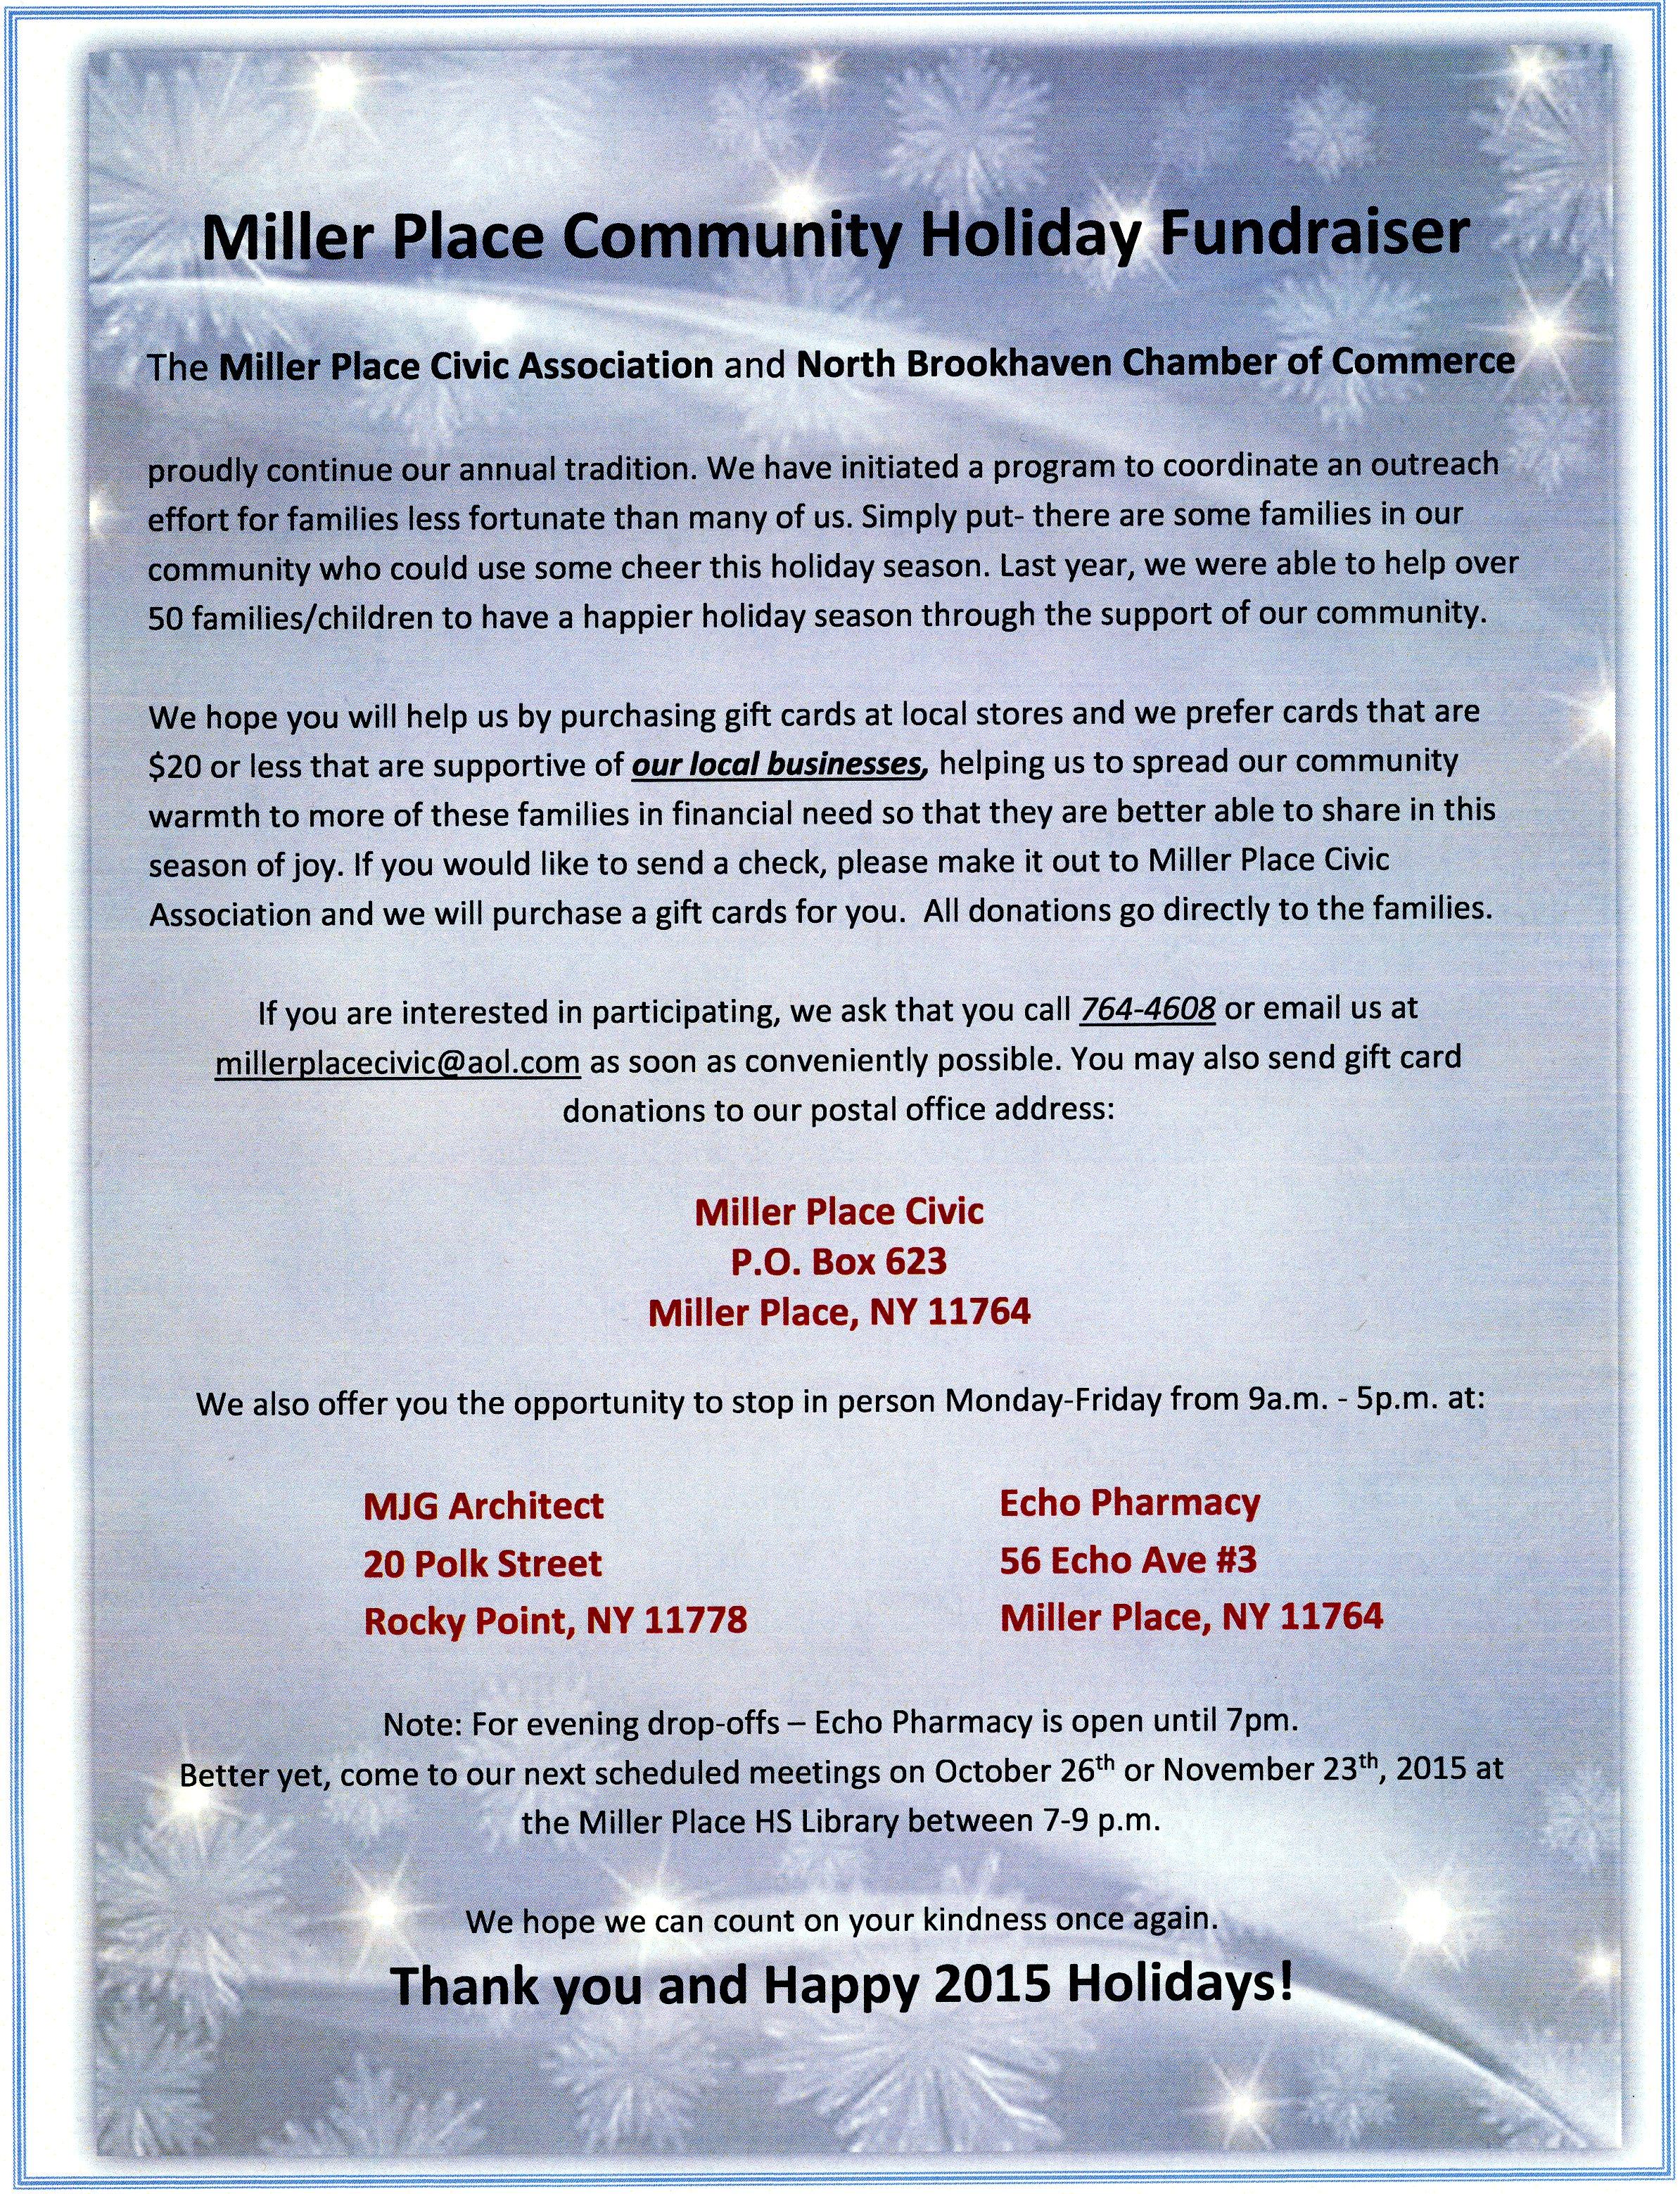 Miller Place Community Fundraiser